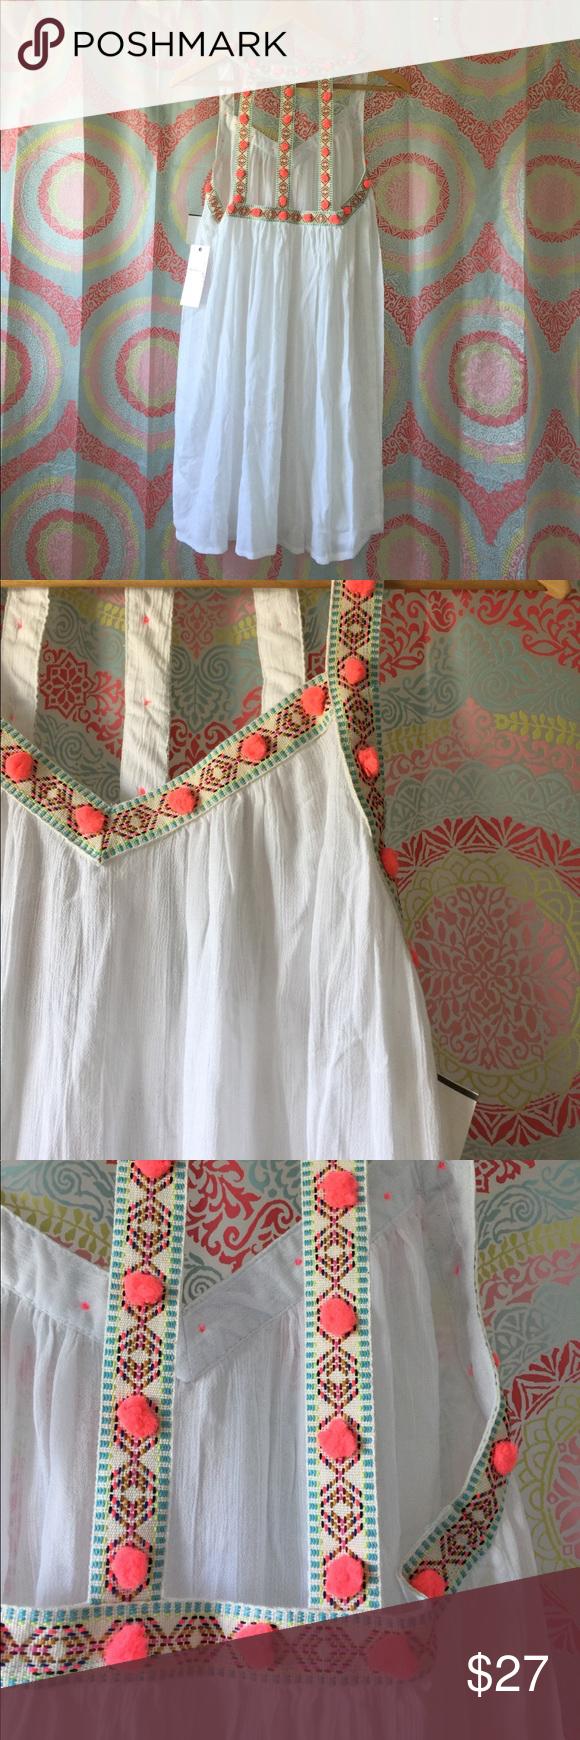 7881a70b80e8 Dress/ Bathing suit cover-up 🌺🌸🌺 goa beachwear by Japna Dresses Mini